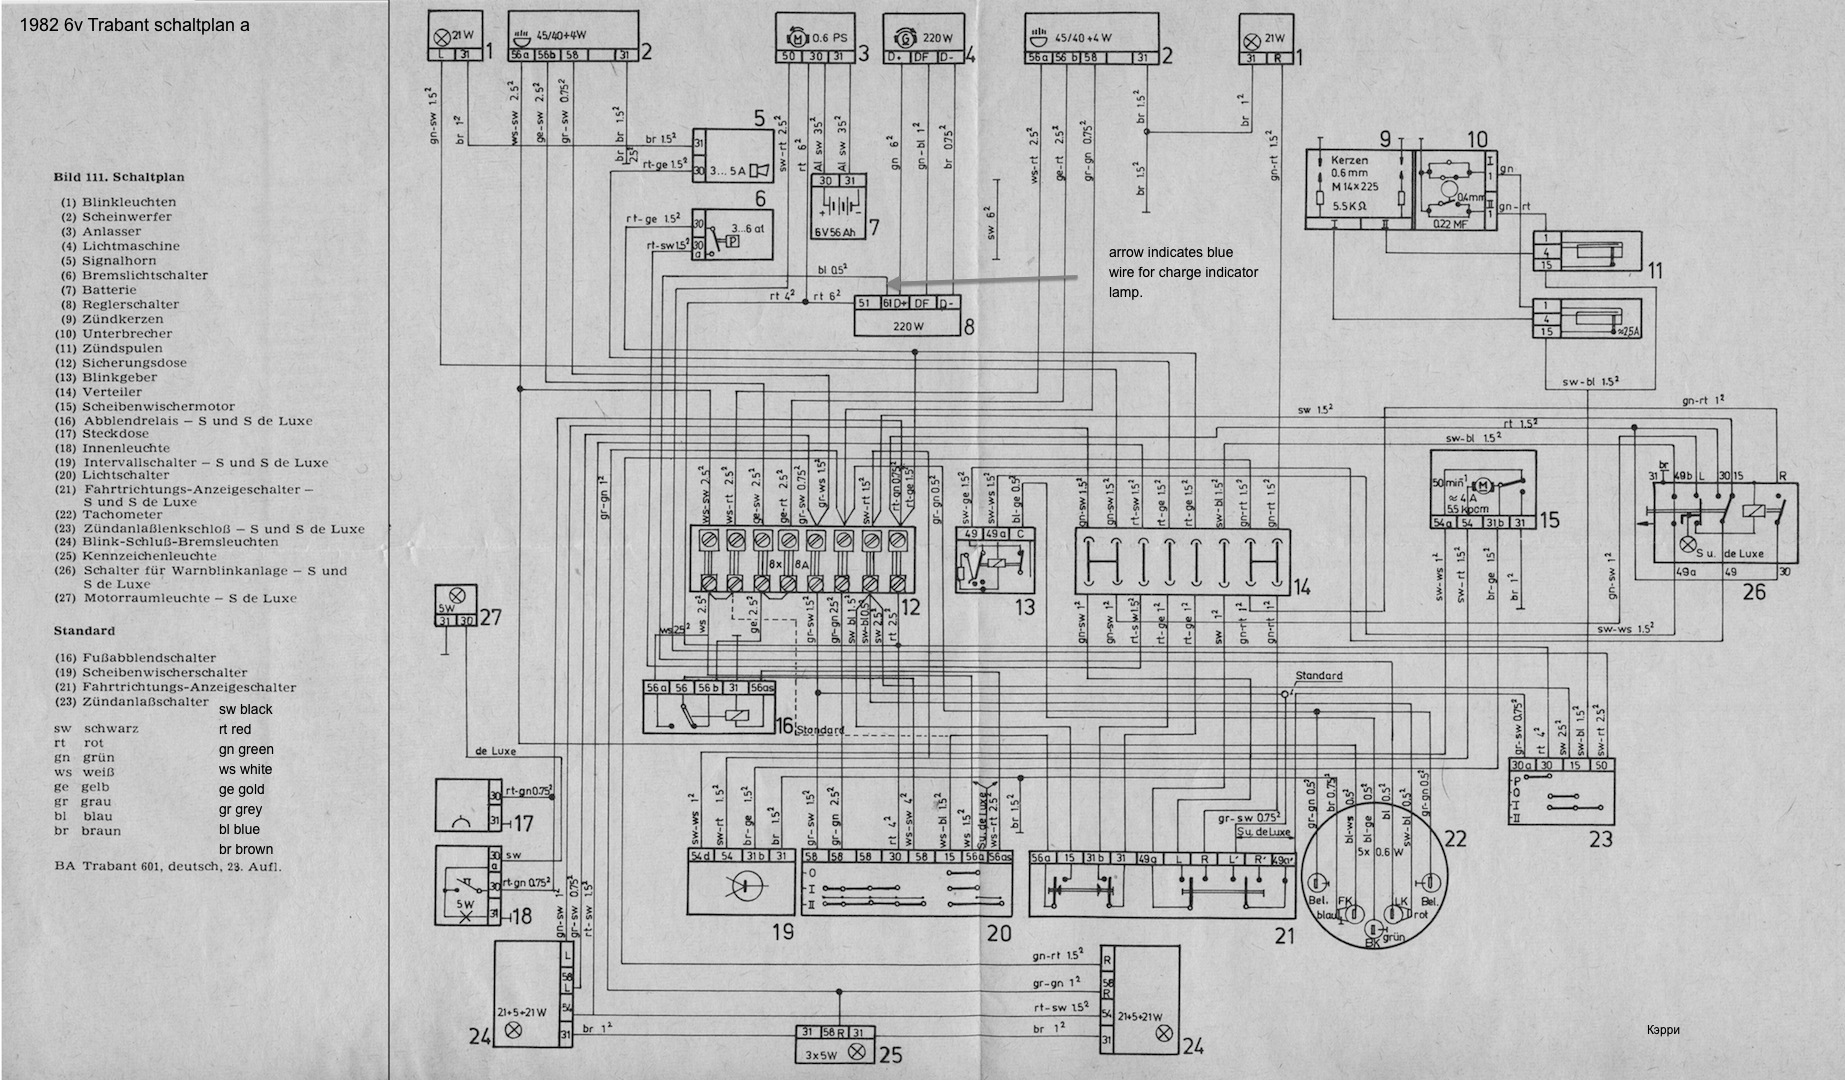 12 volt alternator wiring diagram yamaha g14 gas golf cart converting from 6 volts to   trabantforums.com